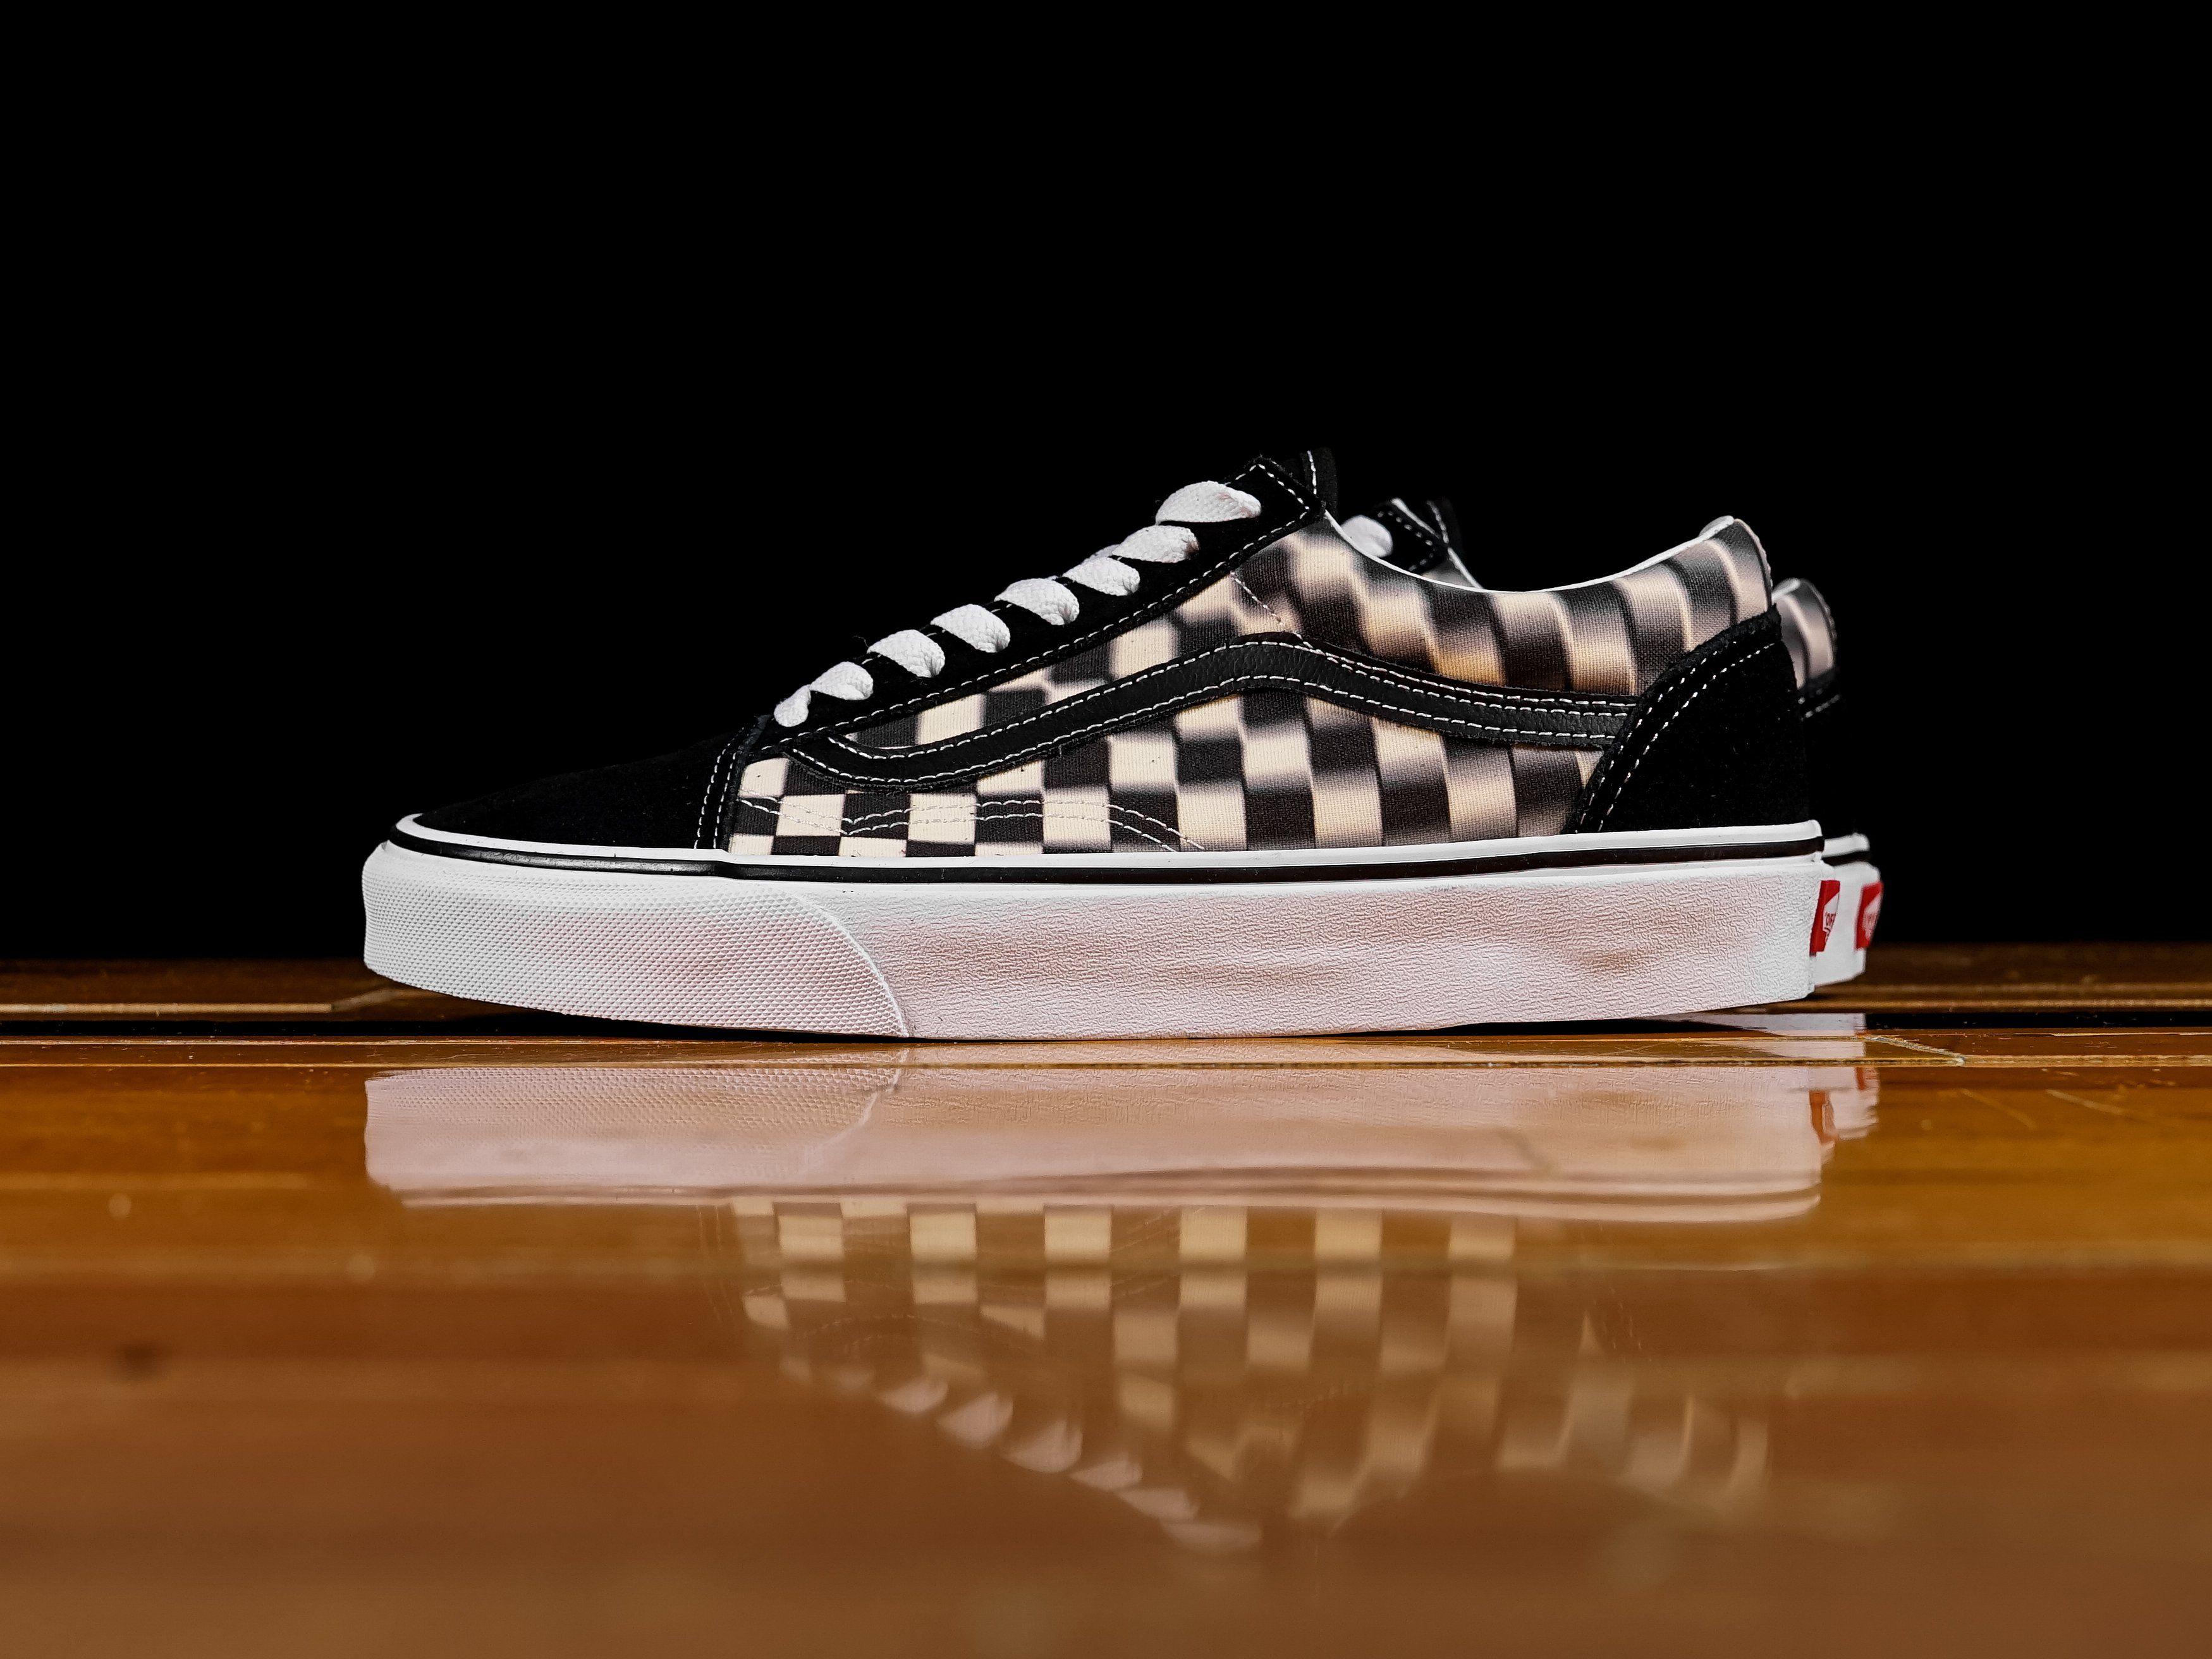 Vans Old Skool Blur Check BlackClassic Low Top Sneakers VN0A38G1VJM Size 6